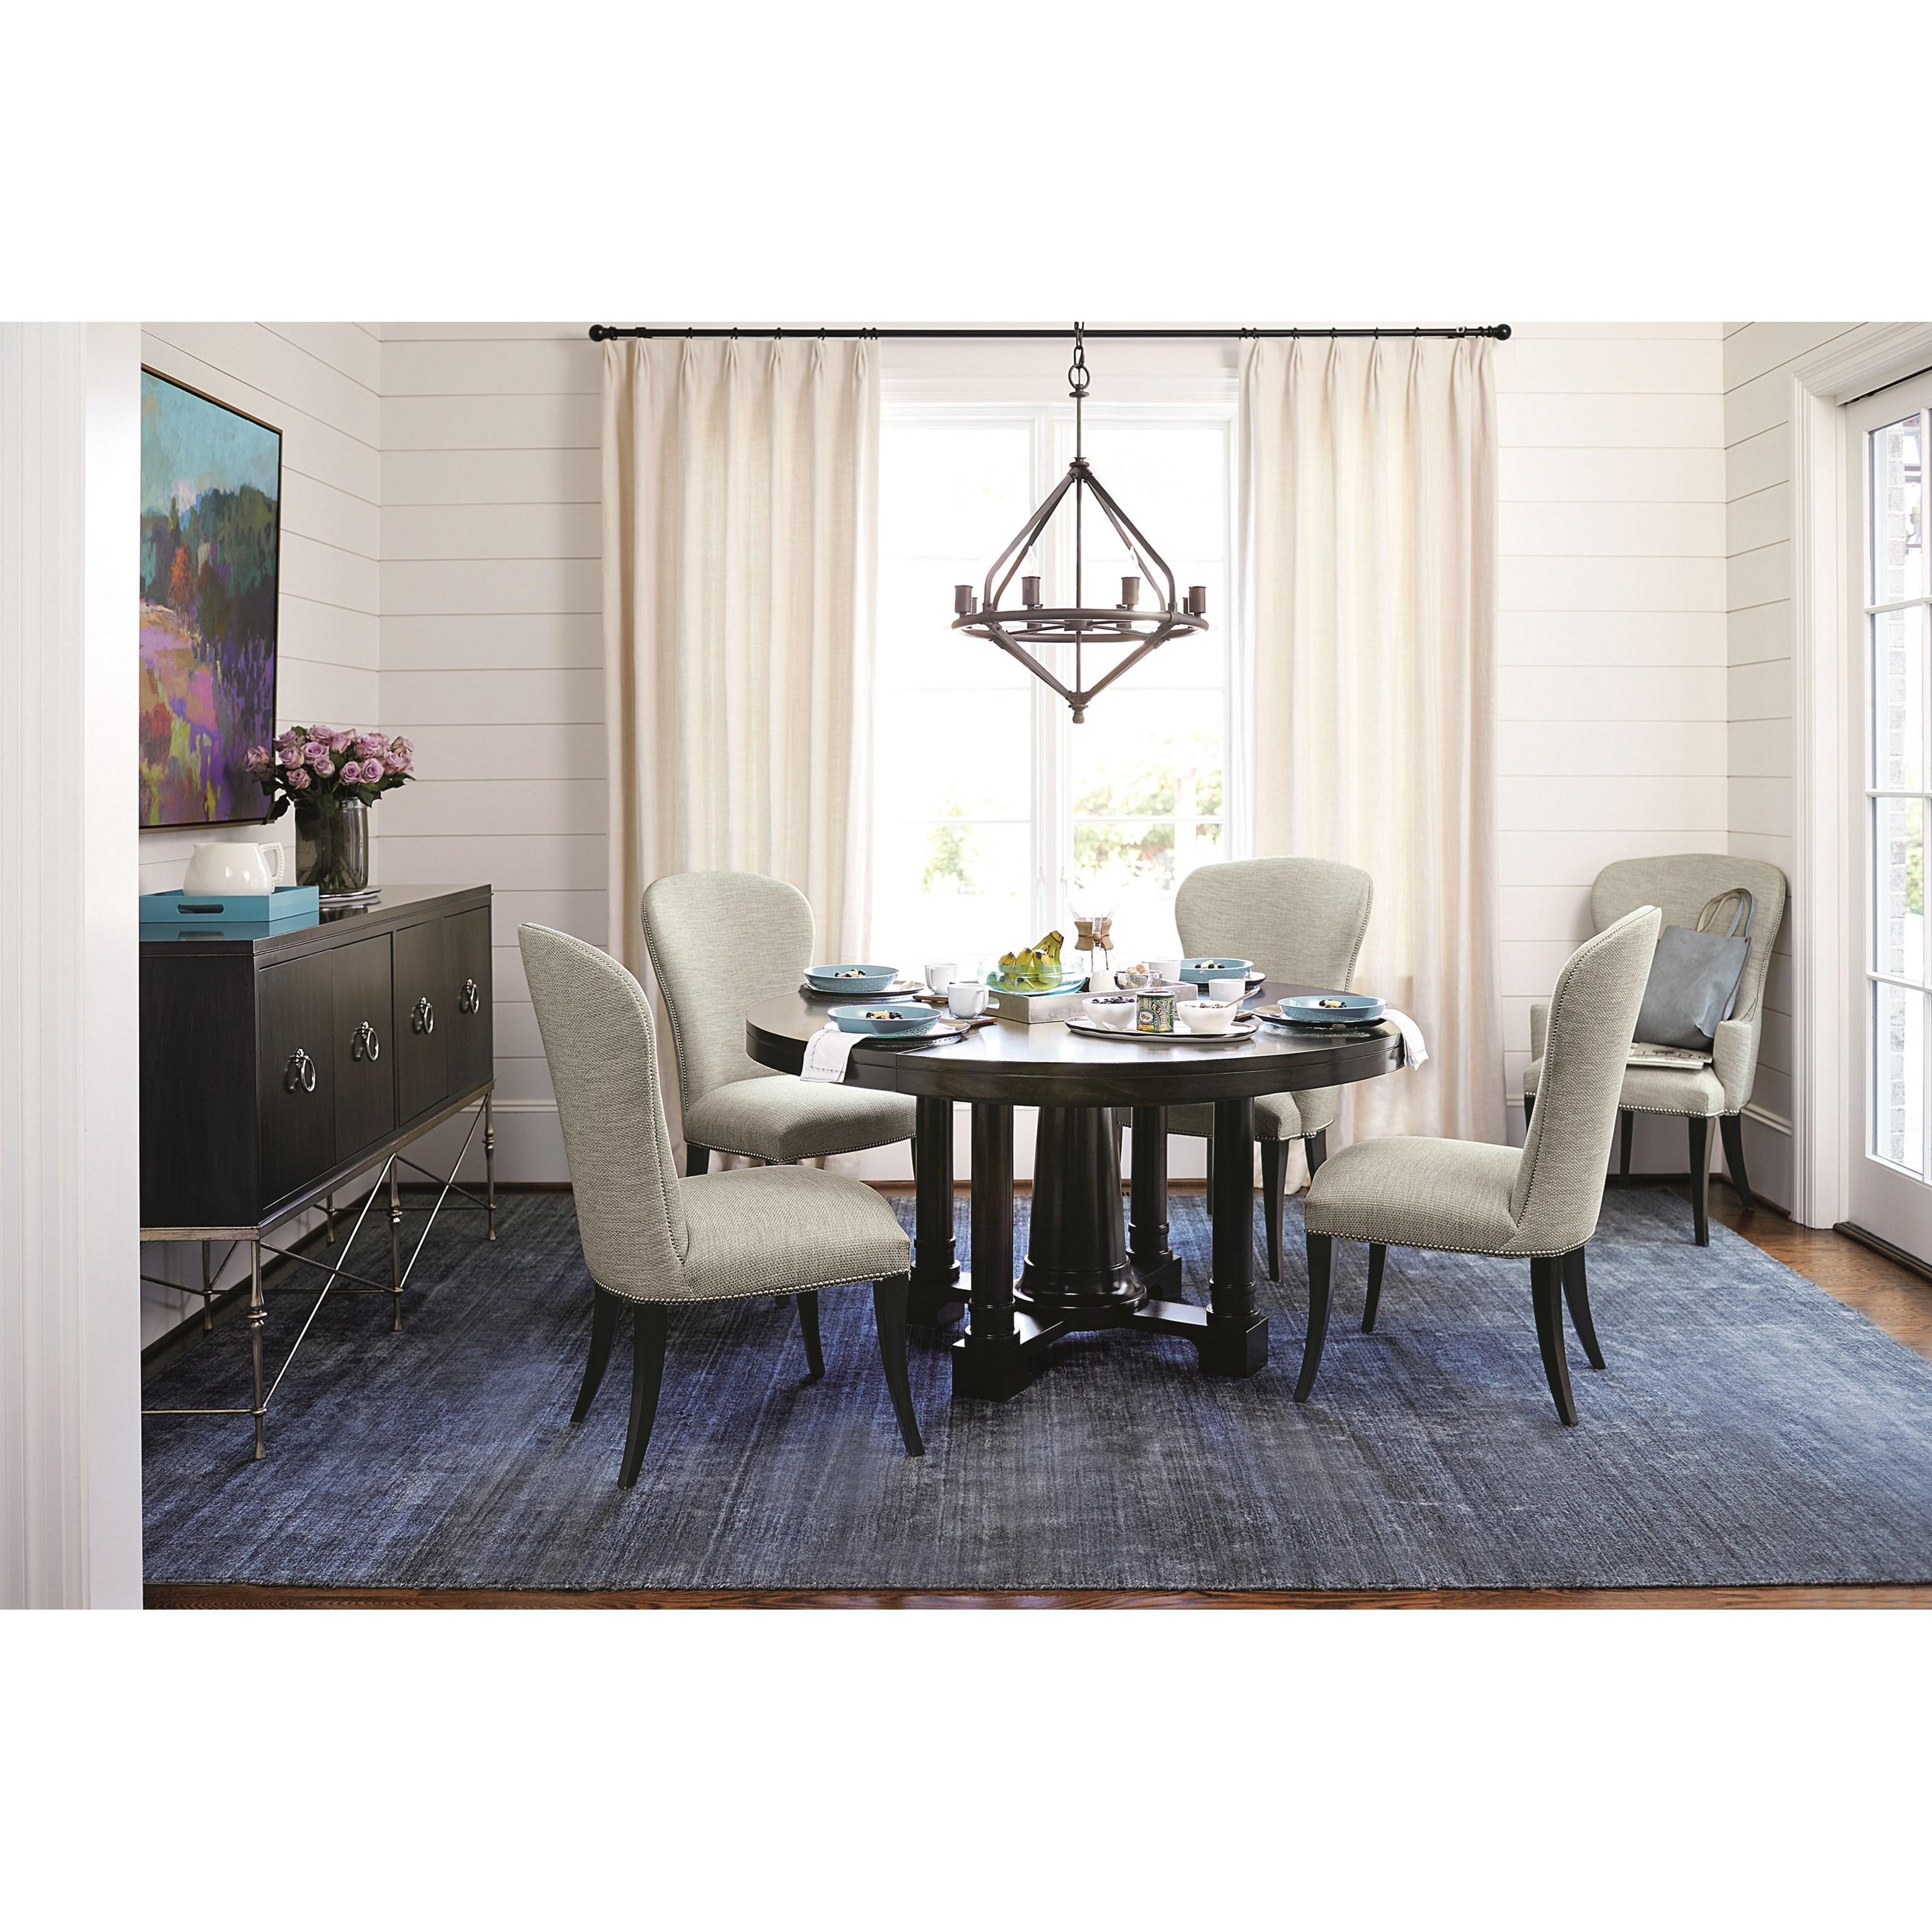 Bernhardt Sutton HouseDining Room Group